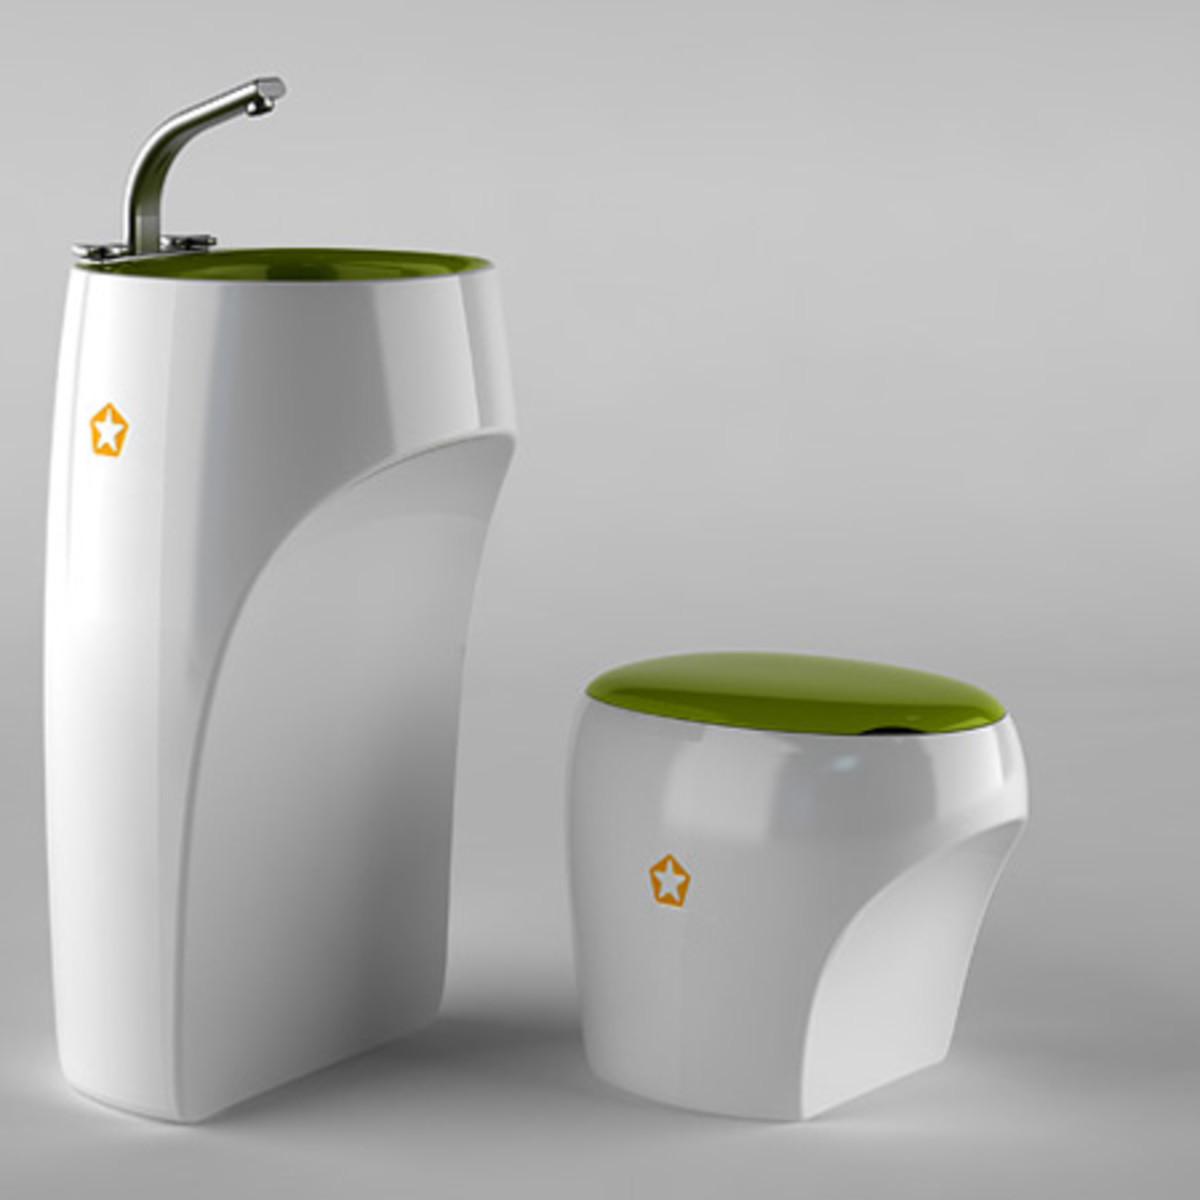 A beautiful white bathroom set can harbor bacteria